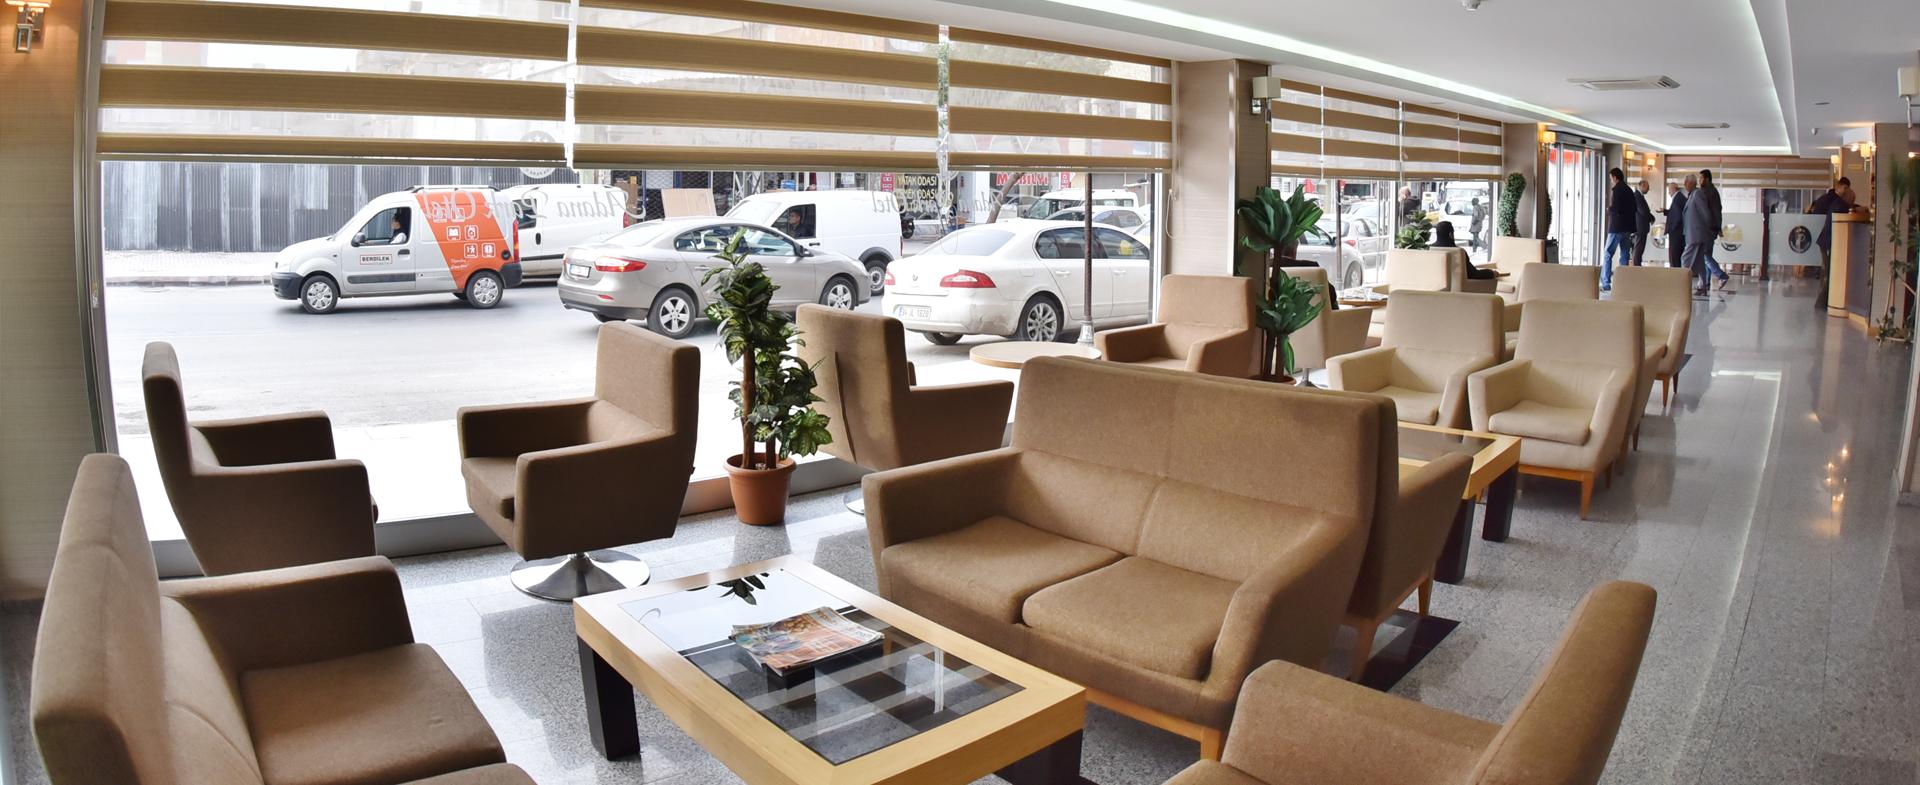 Adana Park Otel Slider -4